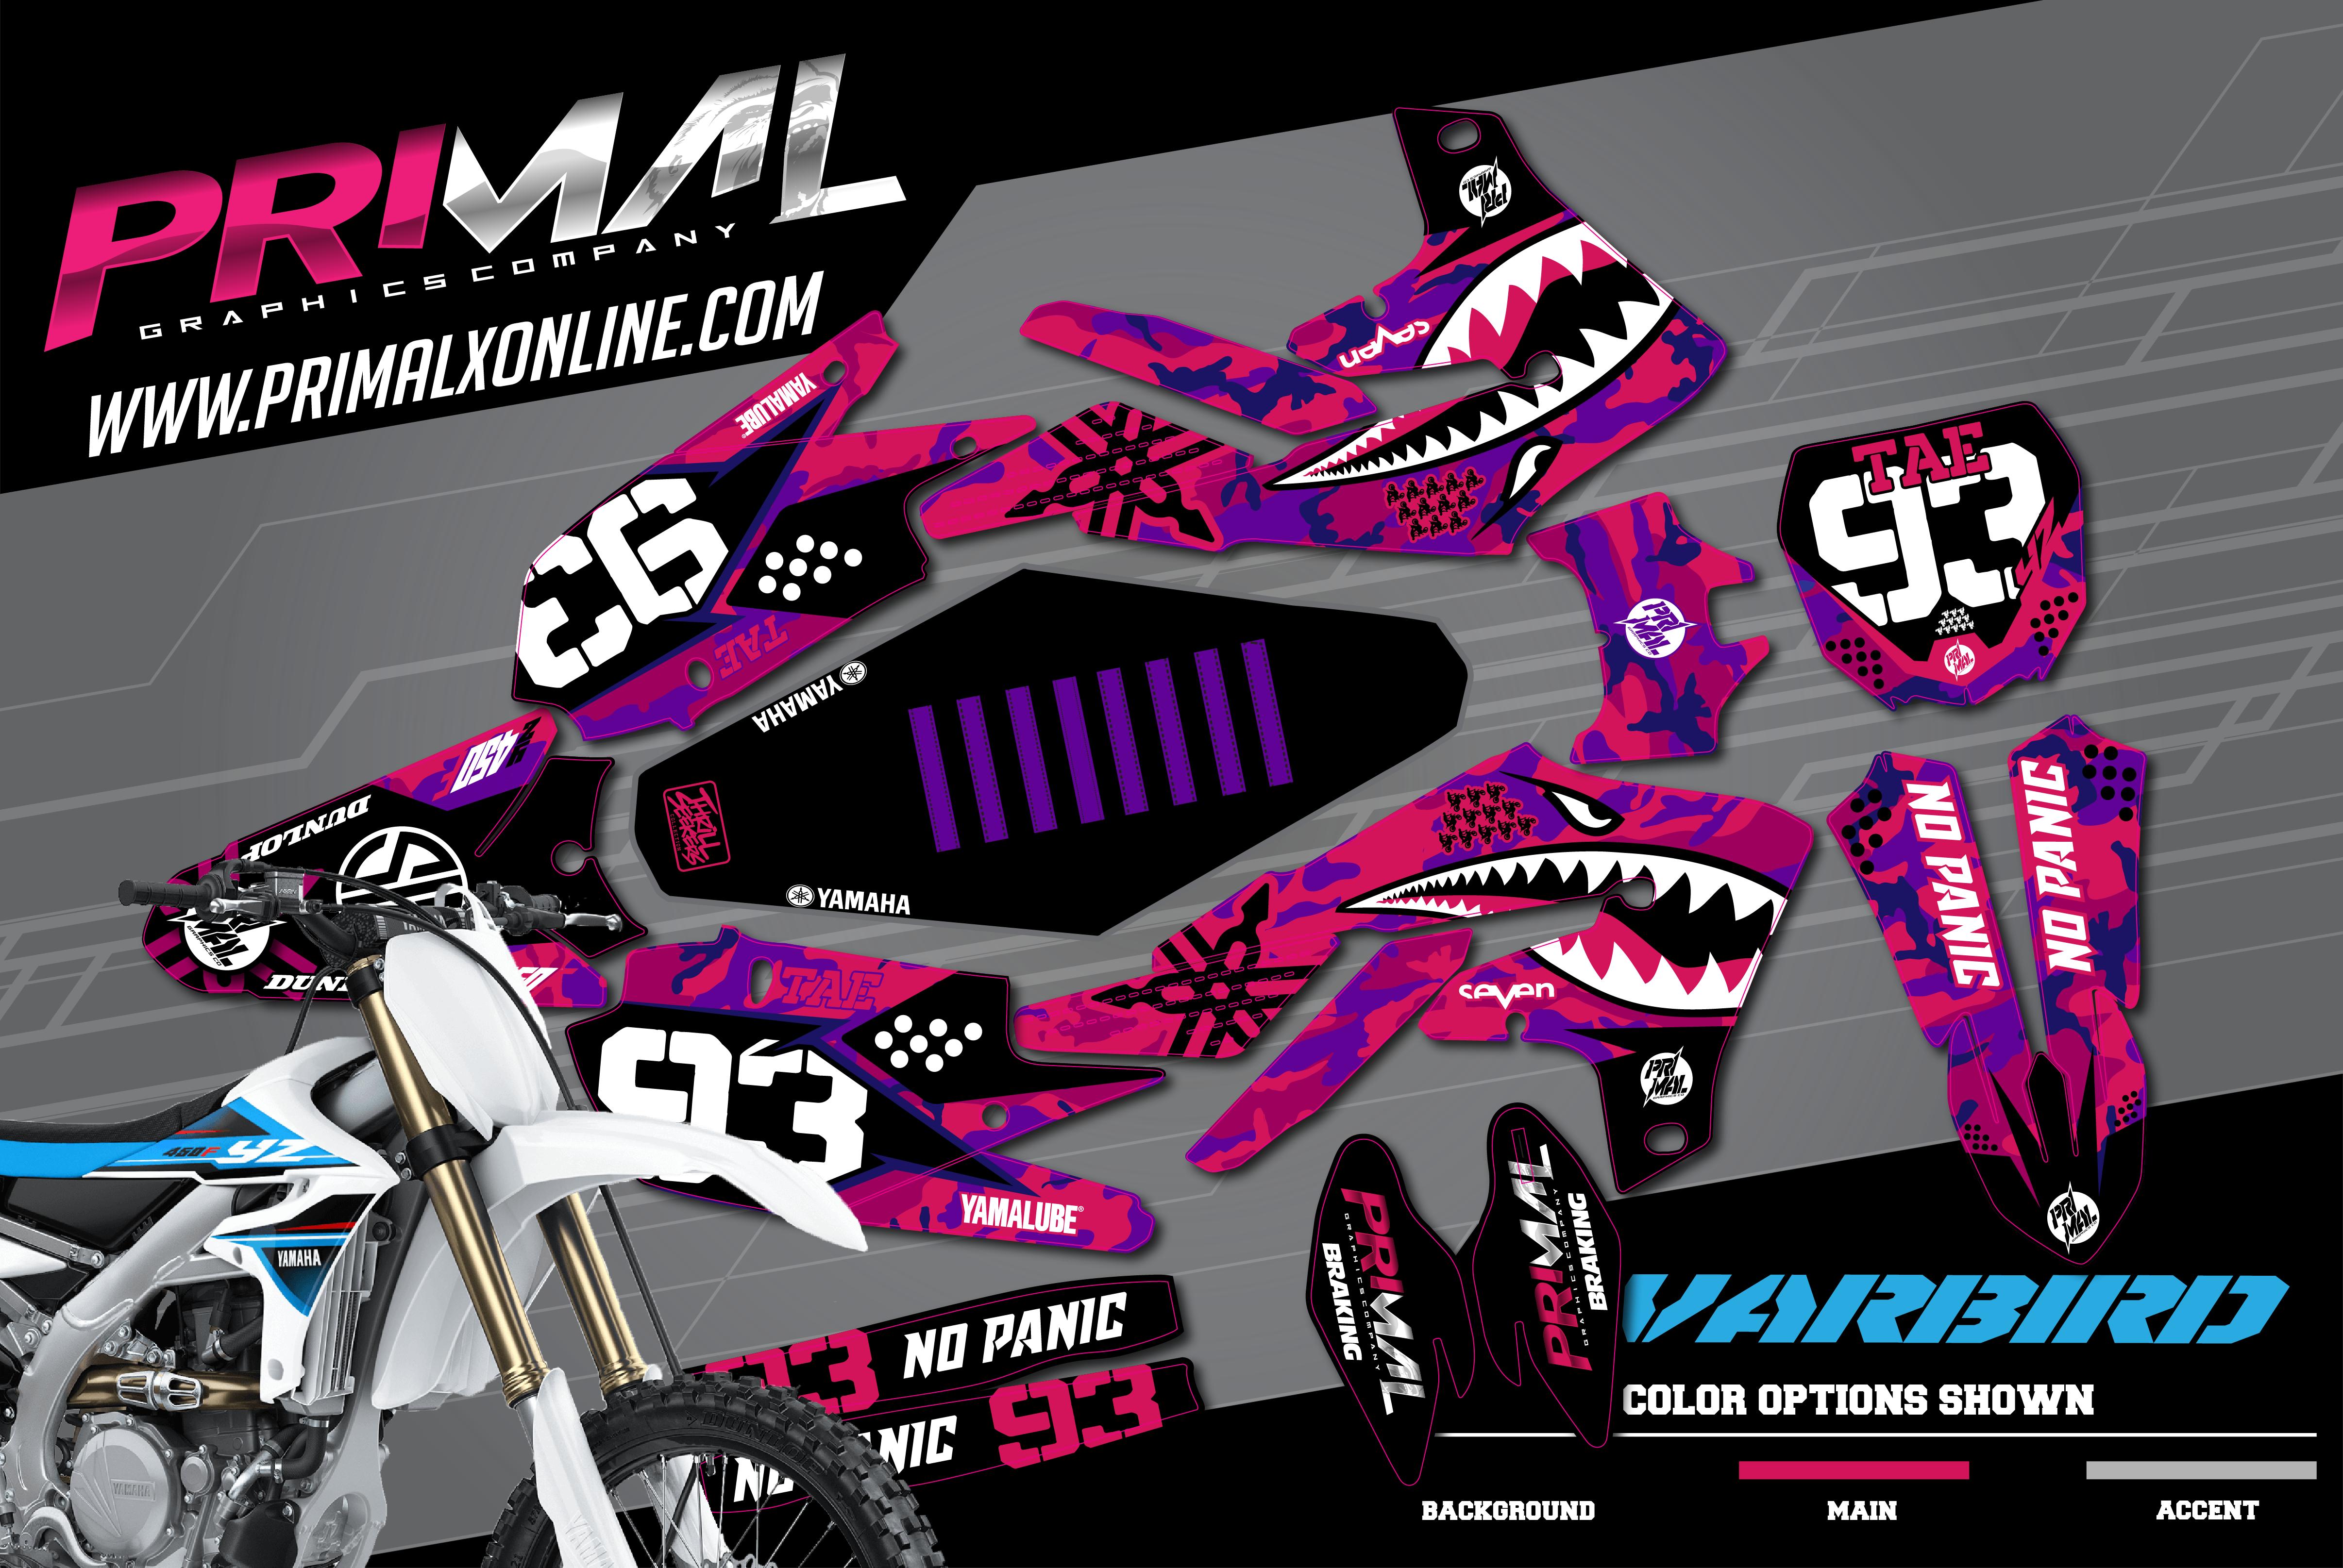 PRIMAL-X-MOTORSPORTS-PRIMAL-GRAPHICS-CO-2021-YAMAHA-YZ250F-YZ450F-MOTOCROSS-GRAPHICS-BIKELIFE-WARBIRD-01